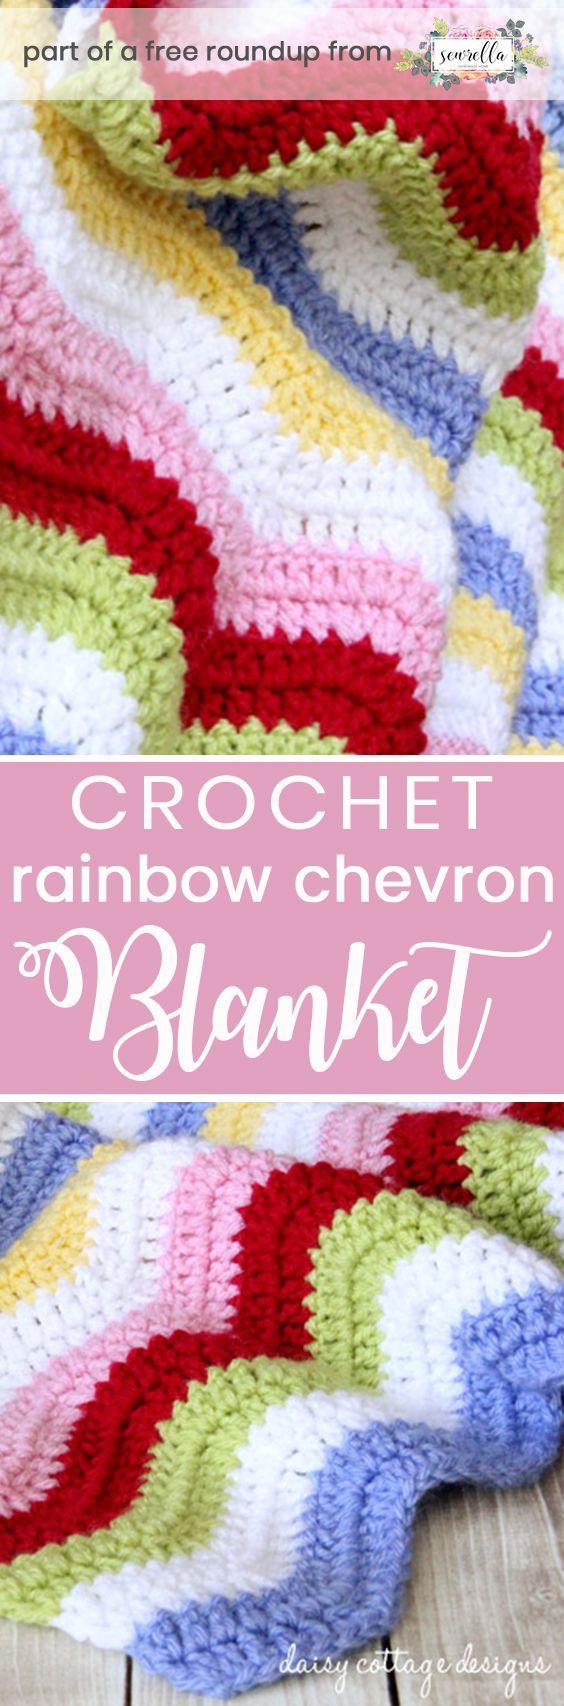 Crochet Rainbow Baby Free Pattern Roundup • Sewrella   Crochet ...